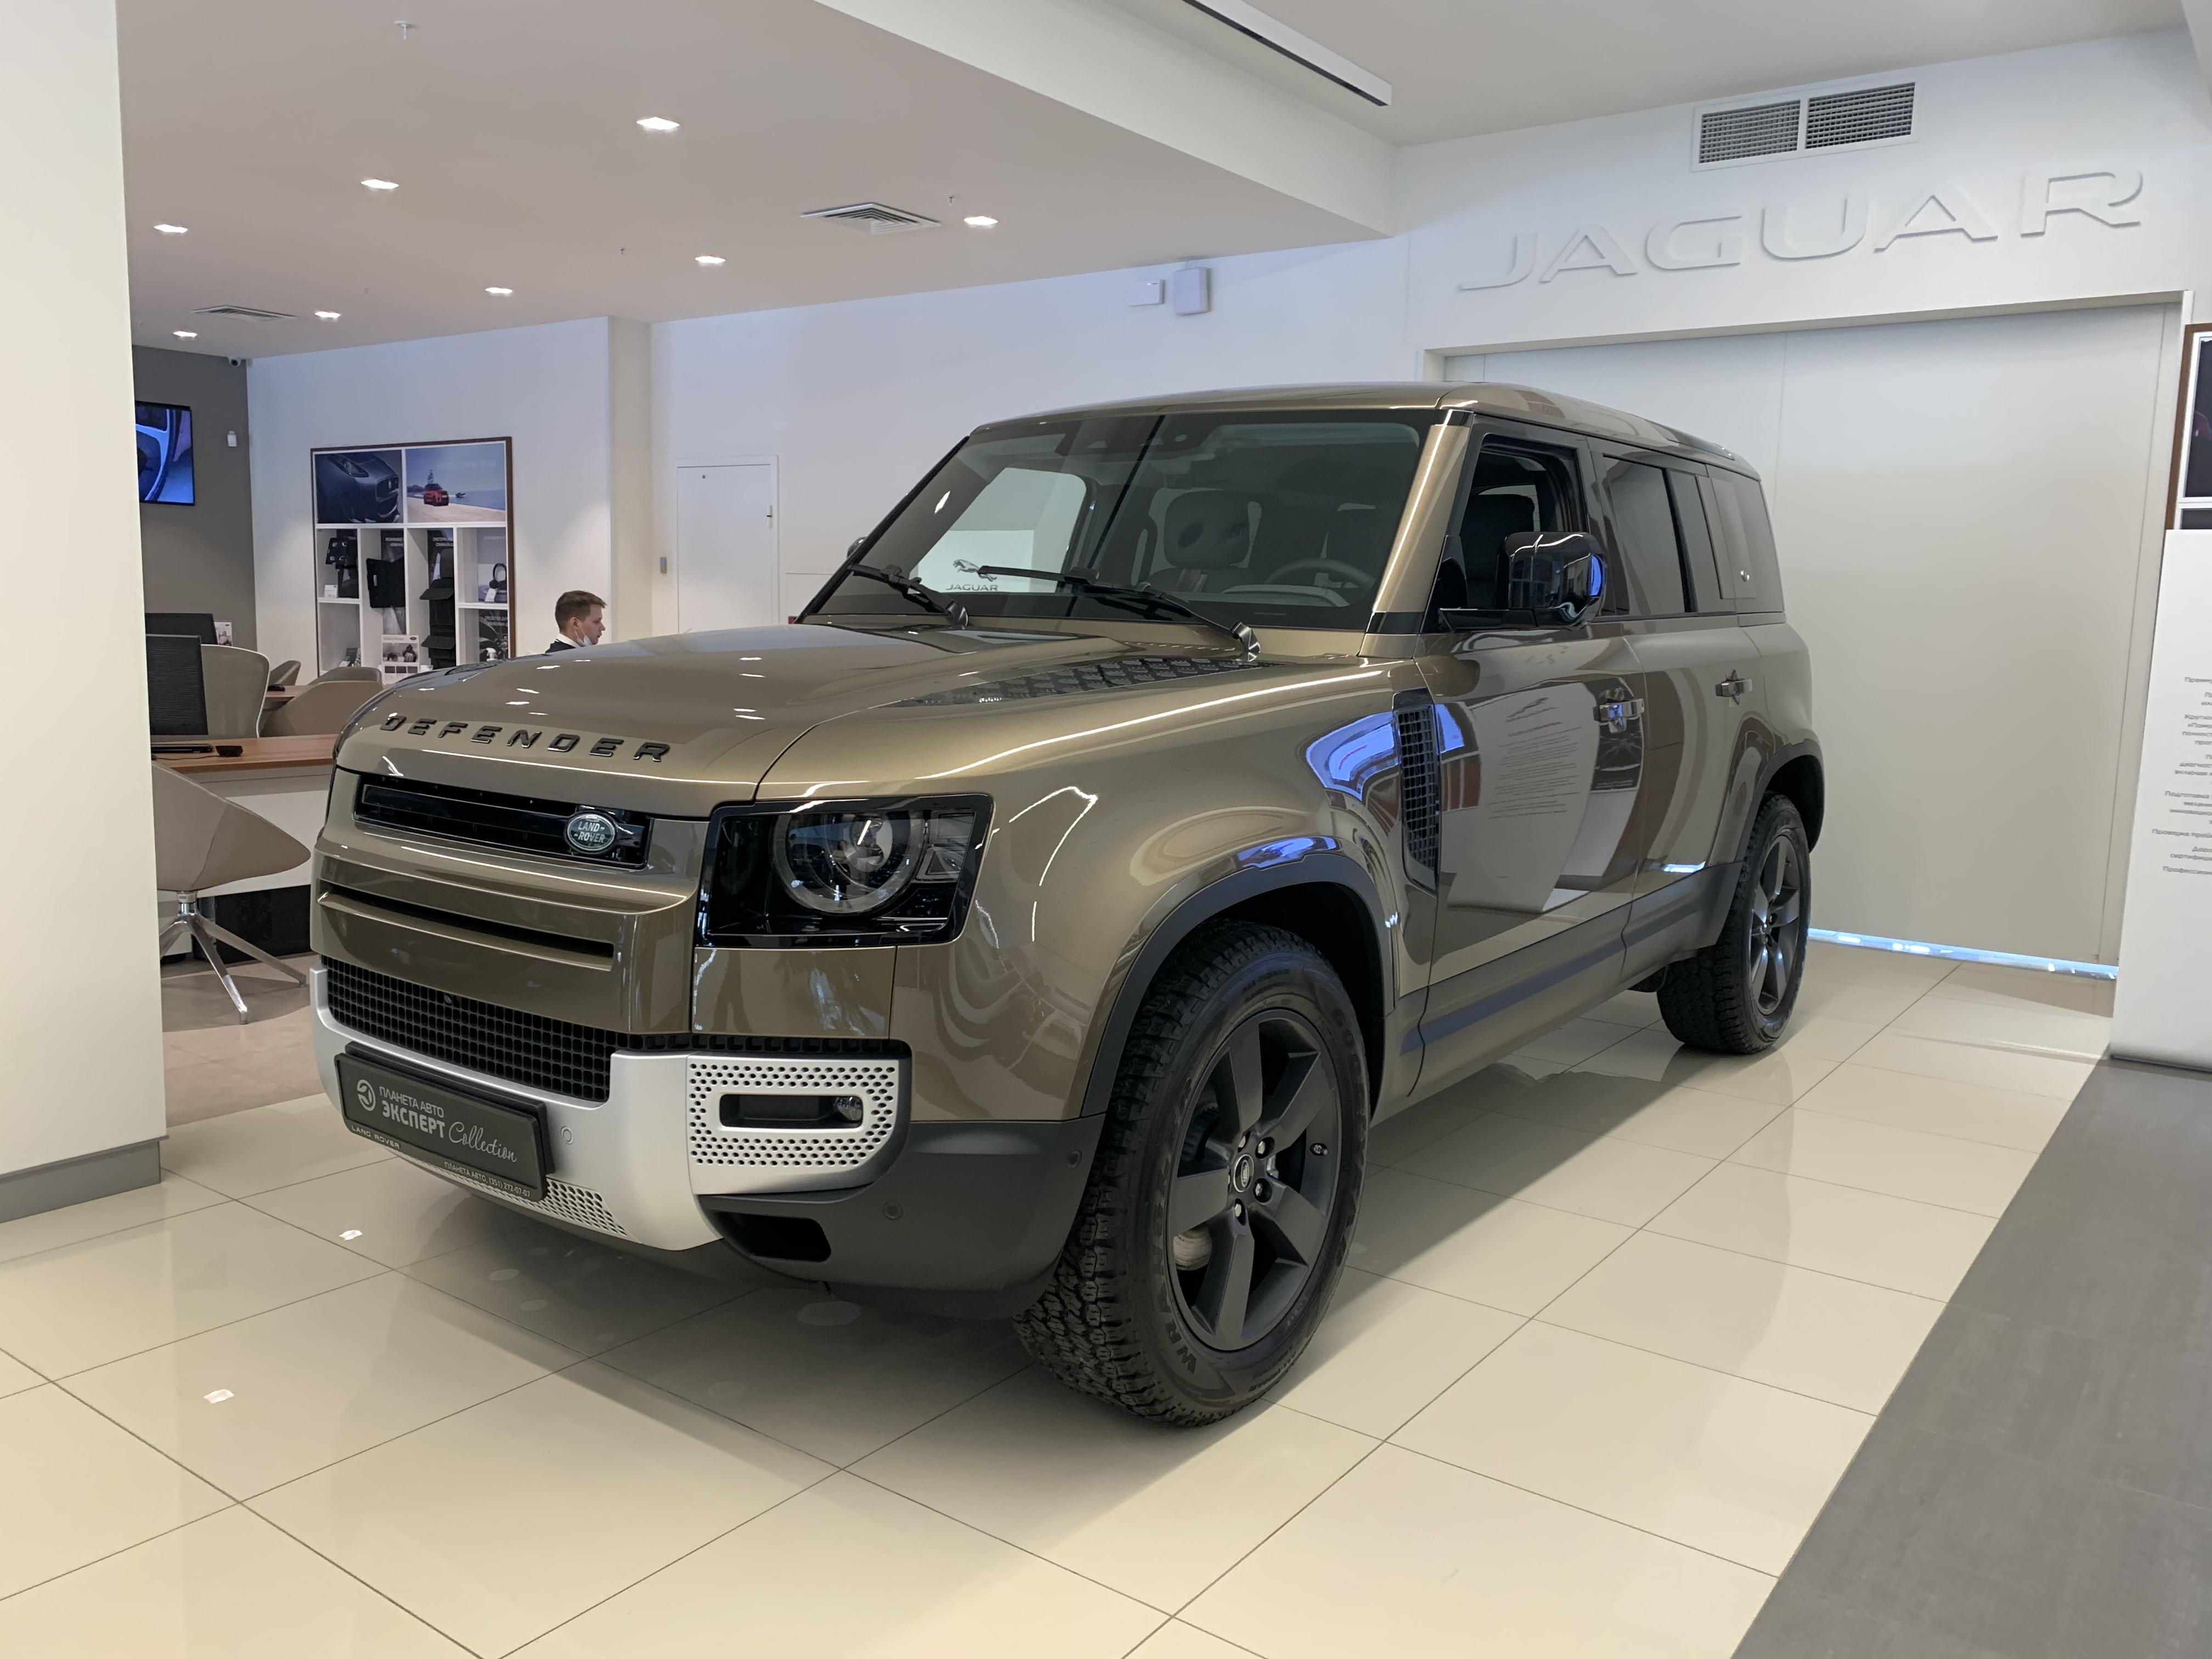 Land Rover Defender 2,0 (240 л.с.) турбо дизель HSE